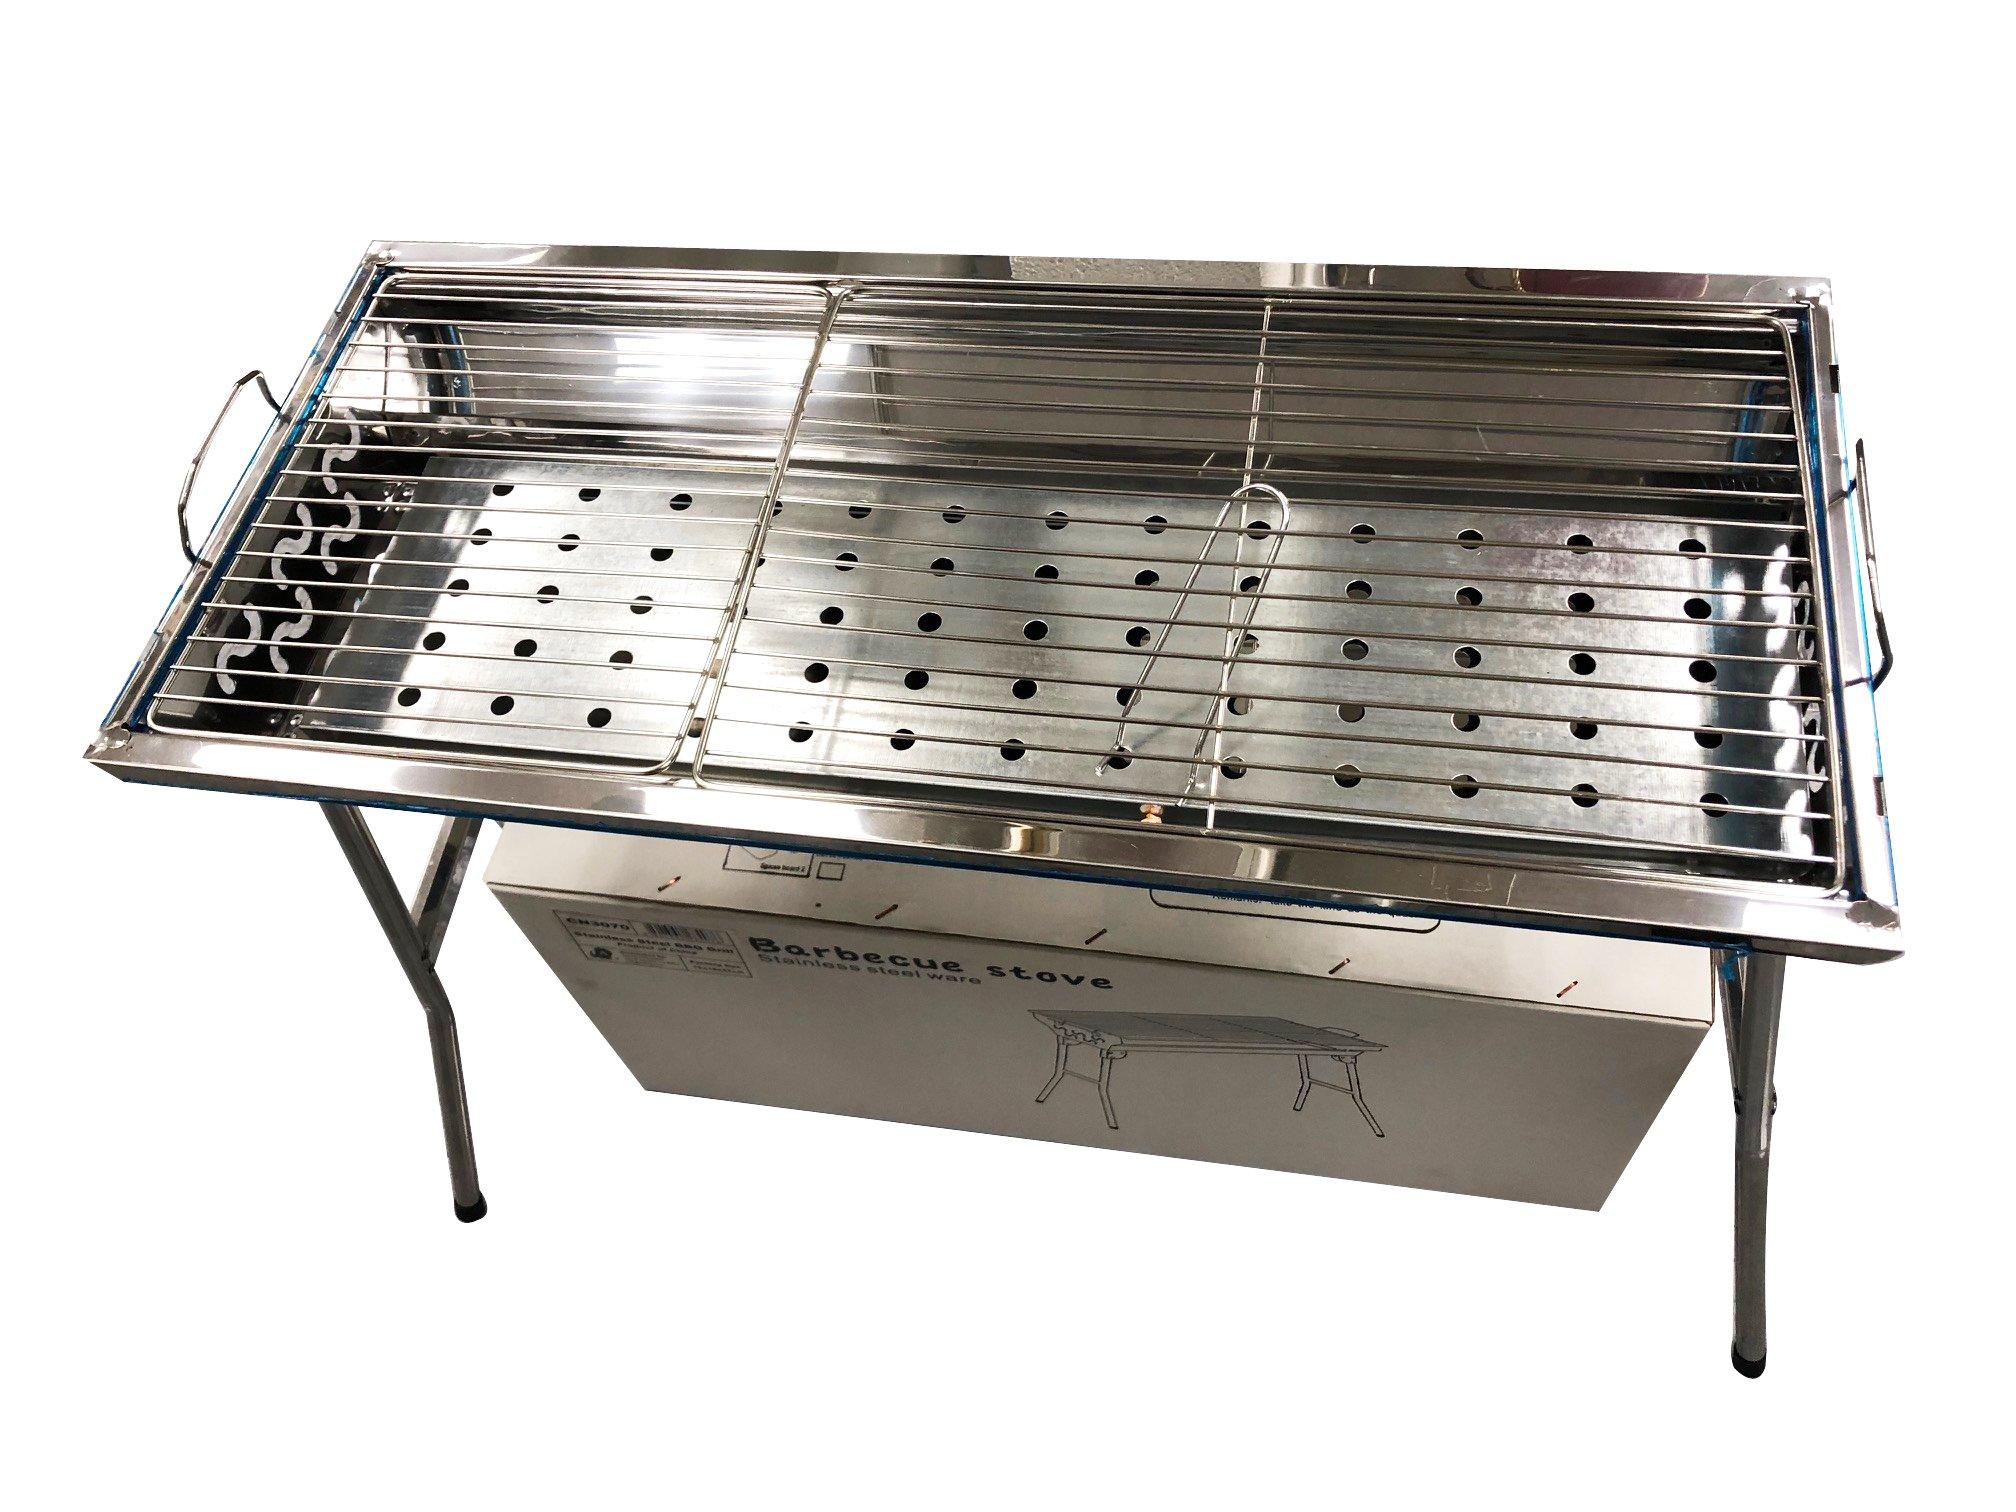 Caravelle Stainless Steel Portable BBQ Kebab Shashlik Grill